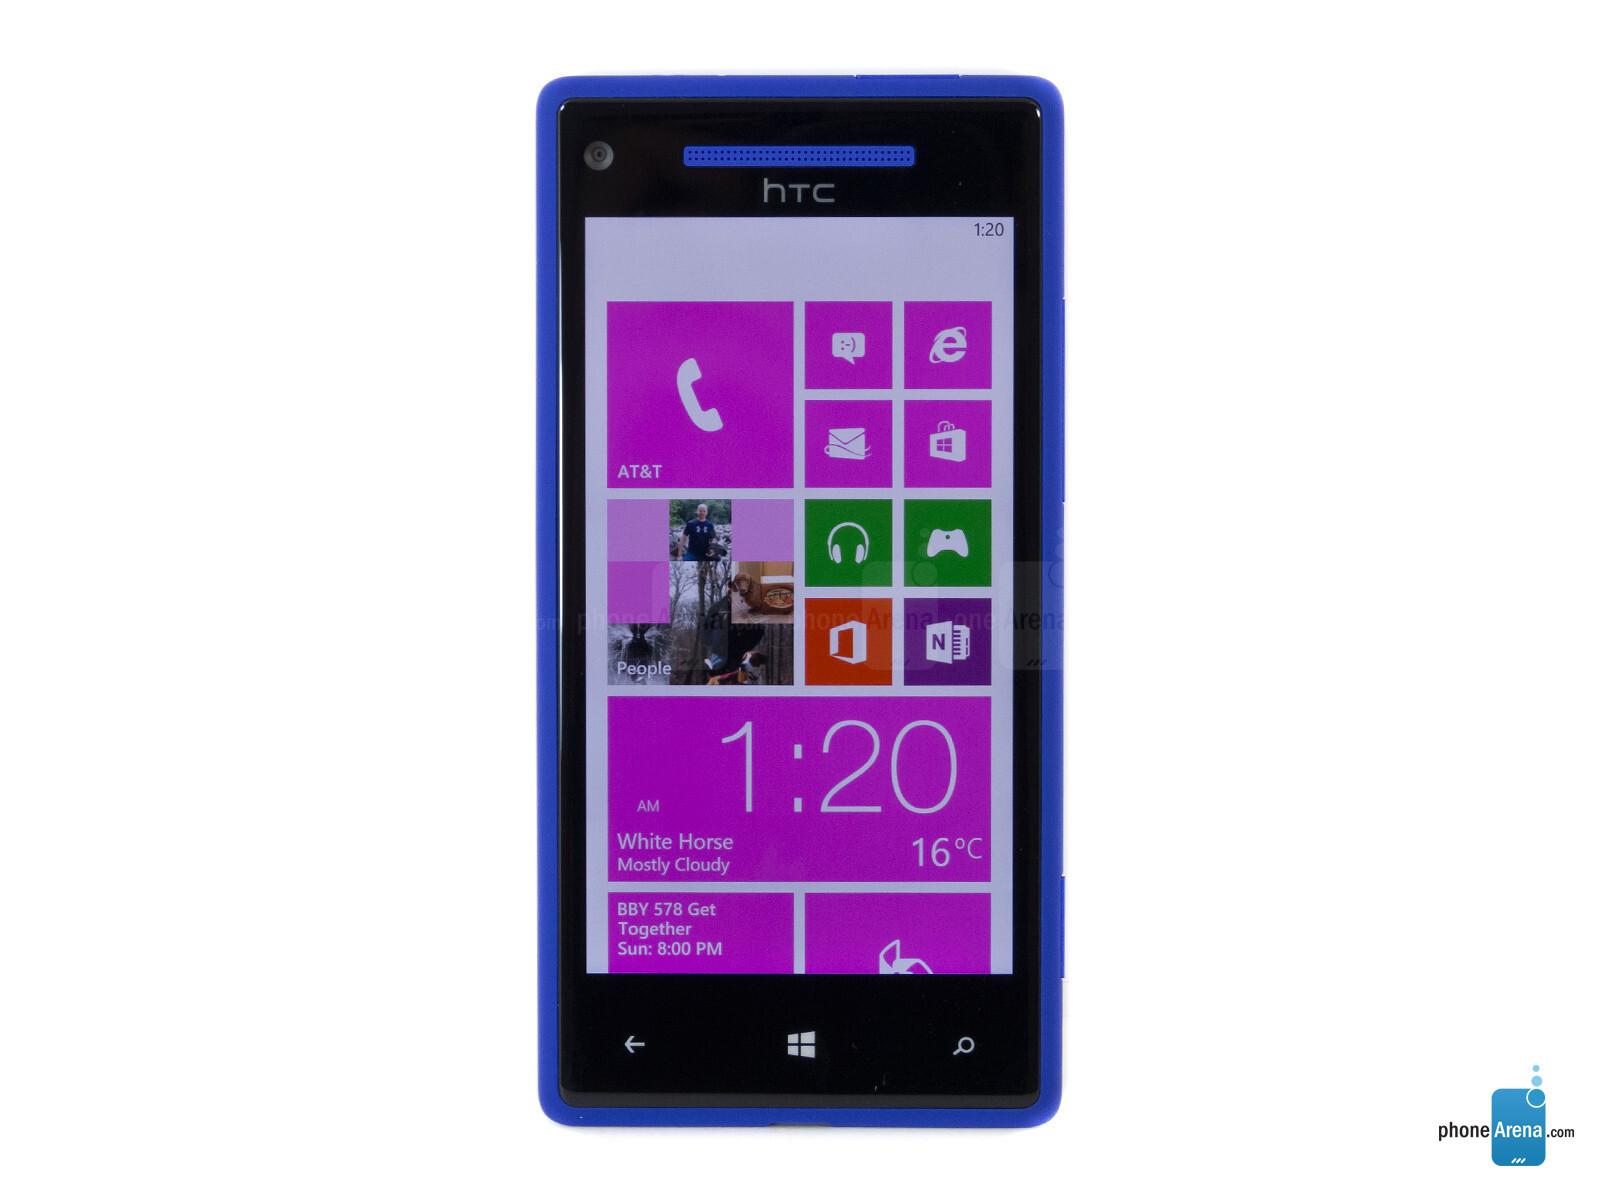 Windows phone 8x htc verizon 8 1 update for Windows phone